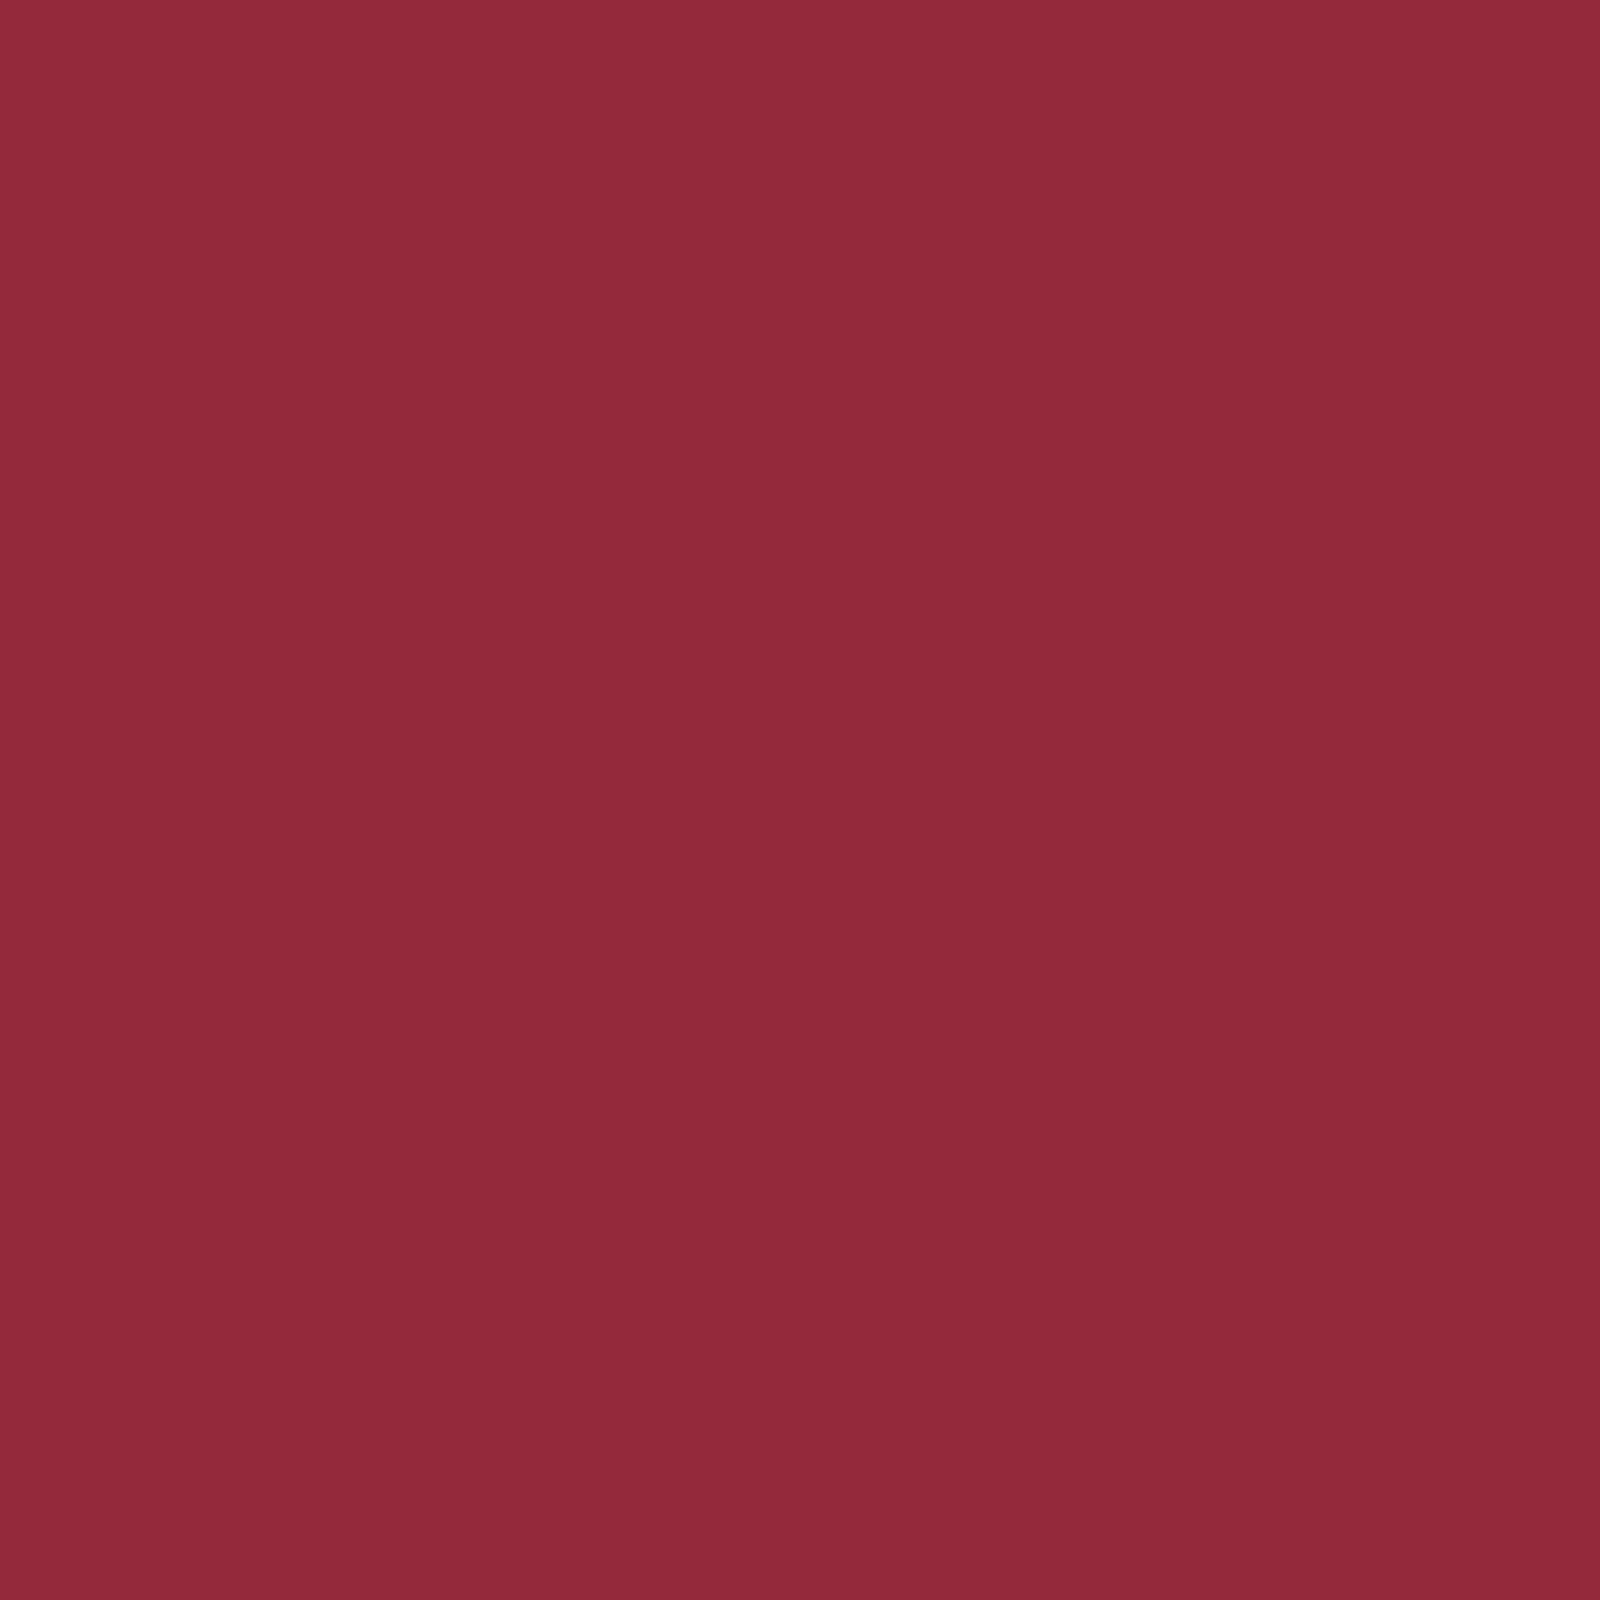 kobra rosu aprins